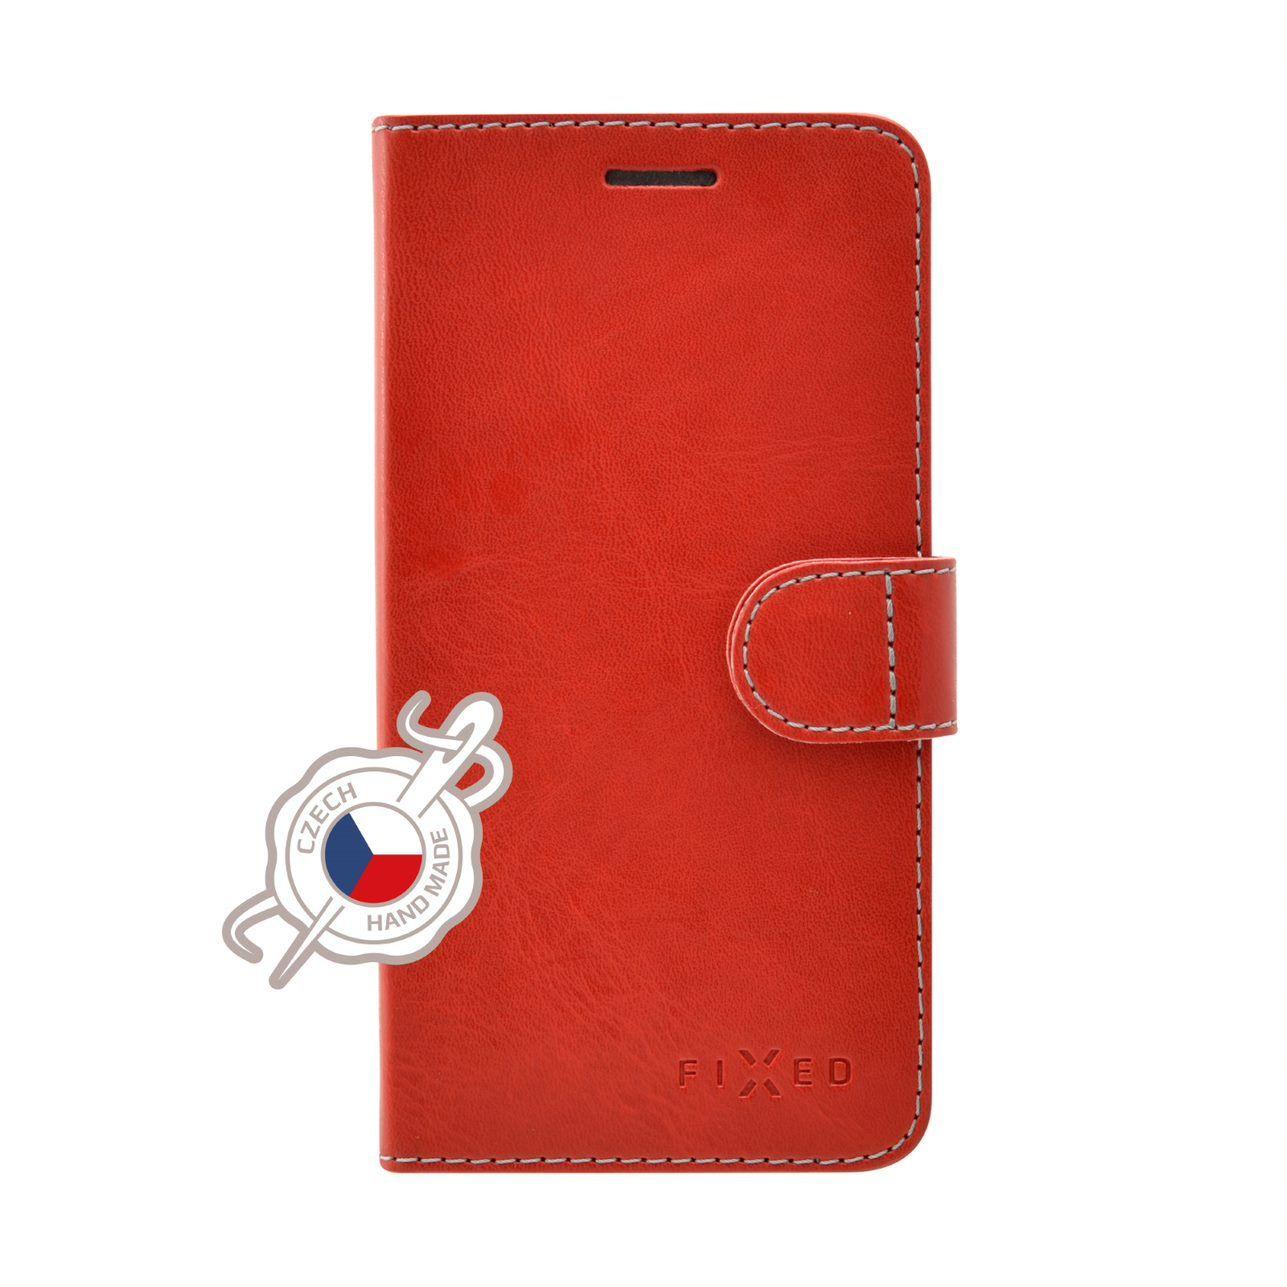 Pouzdro typu kniha FIXED FIT pro Samsung Galaxy A70/A70s, červené